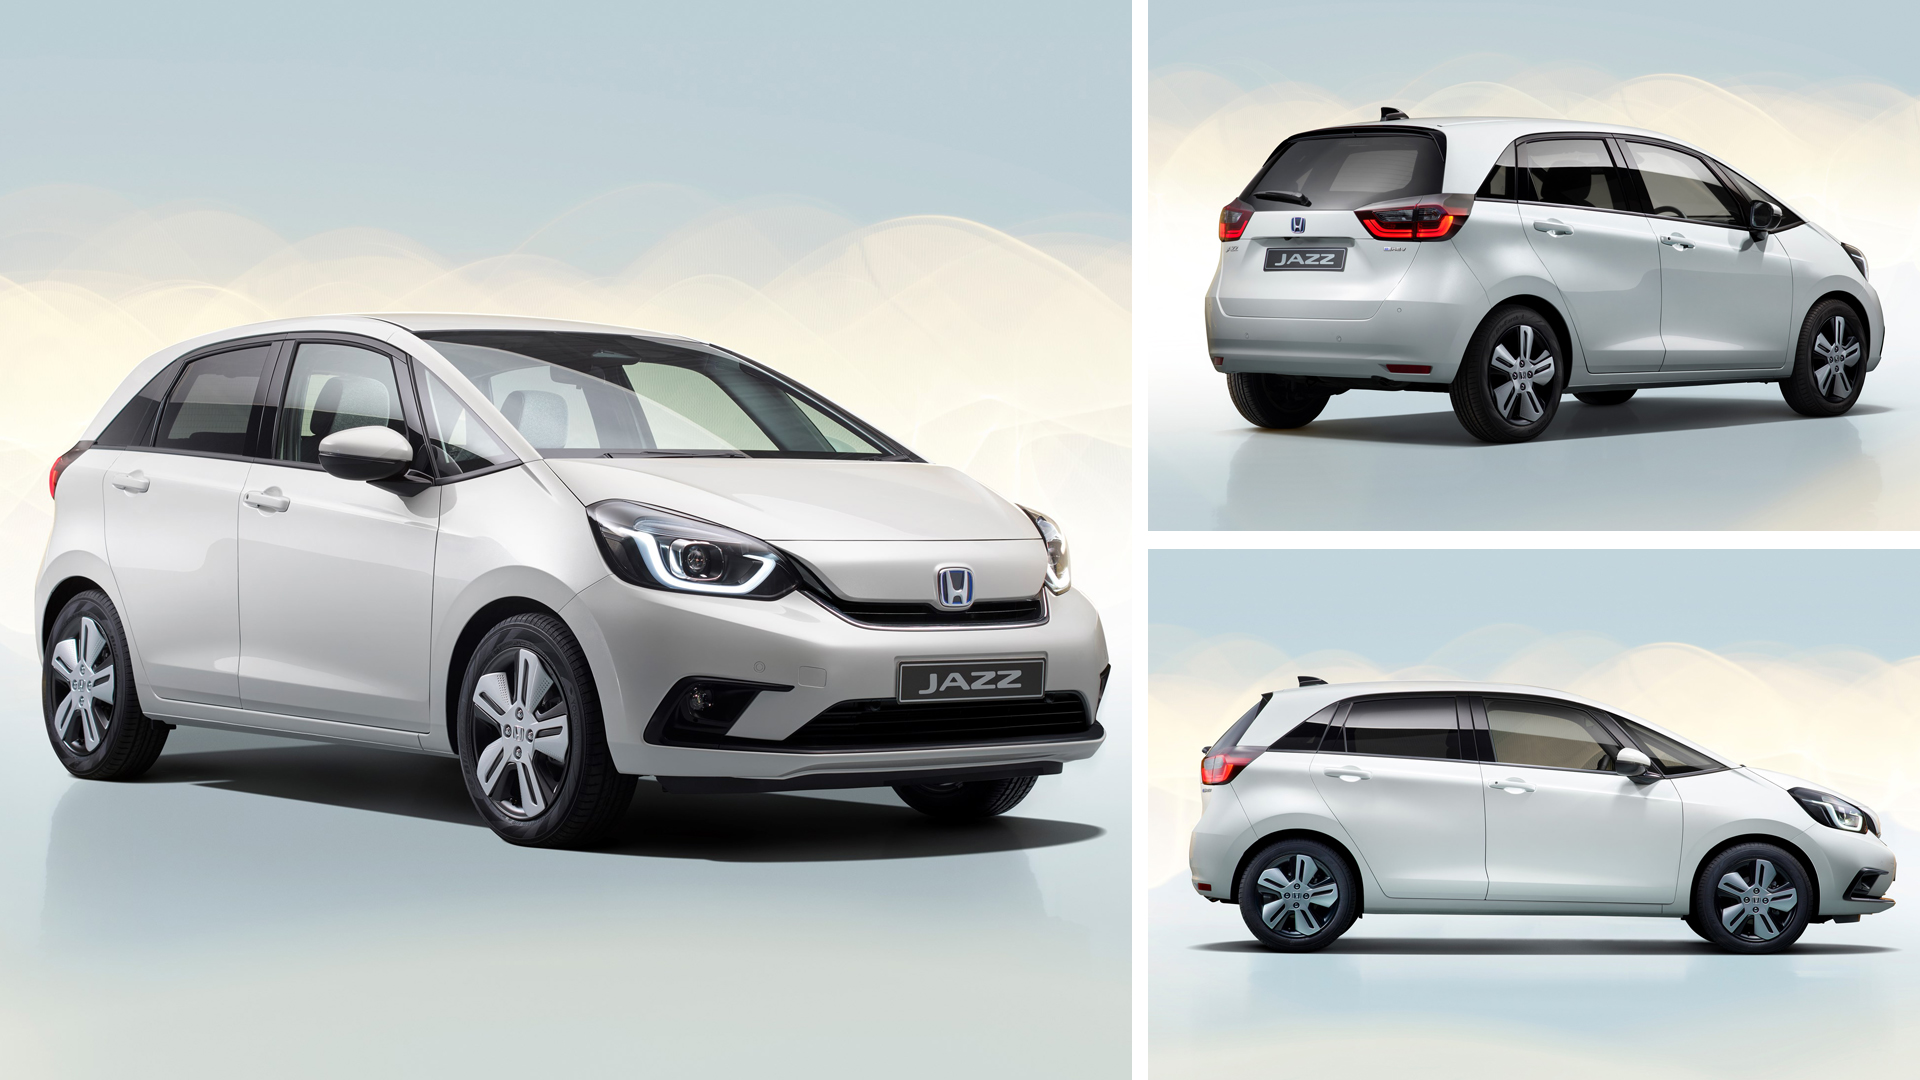 Honda Jazz Fit 2020